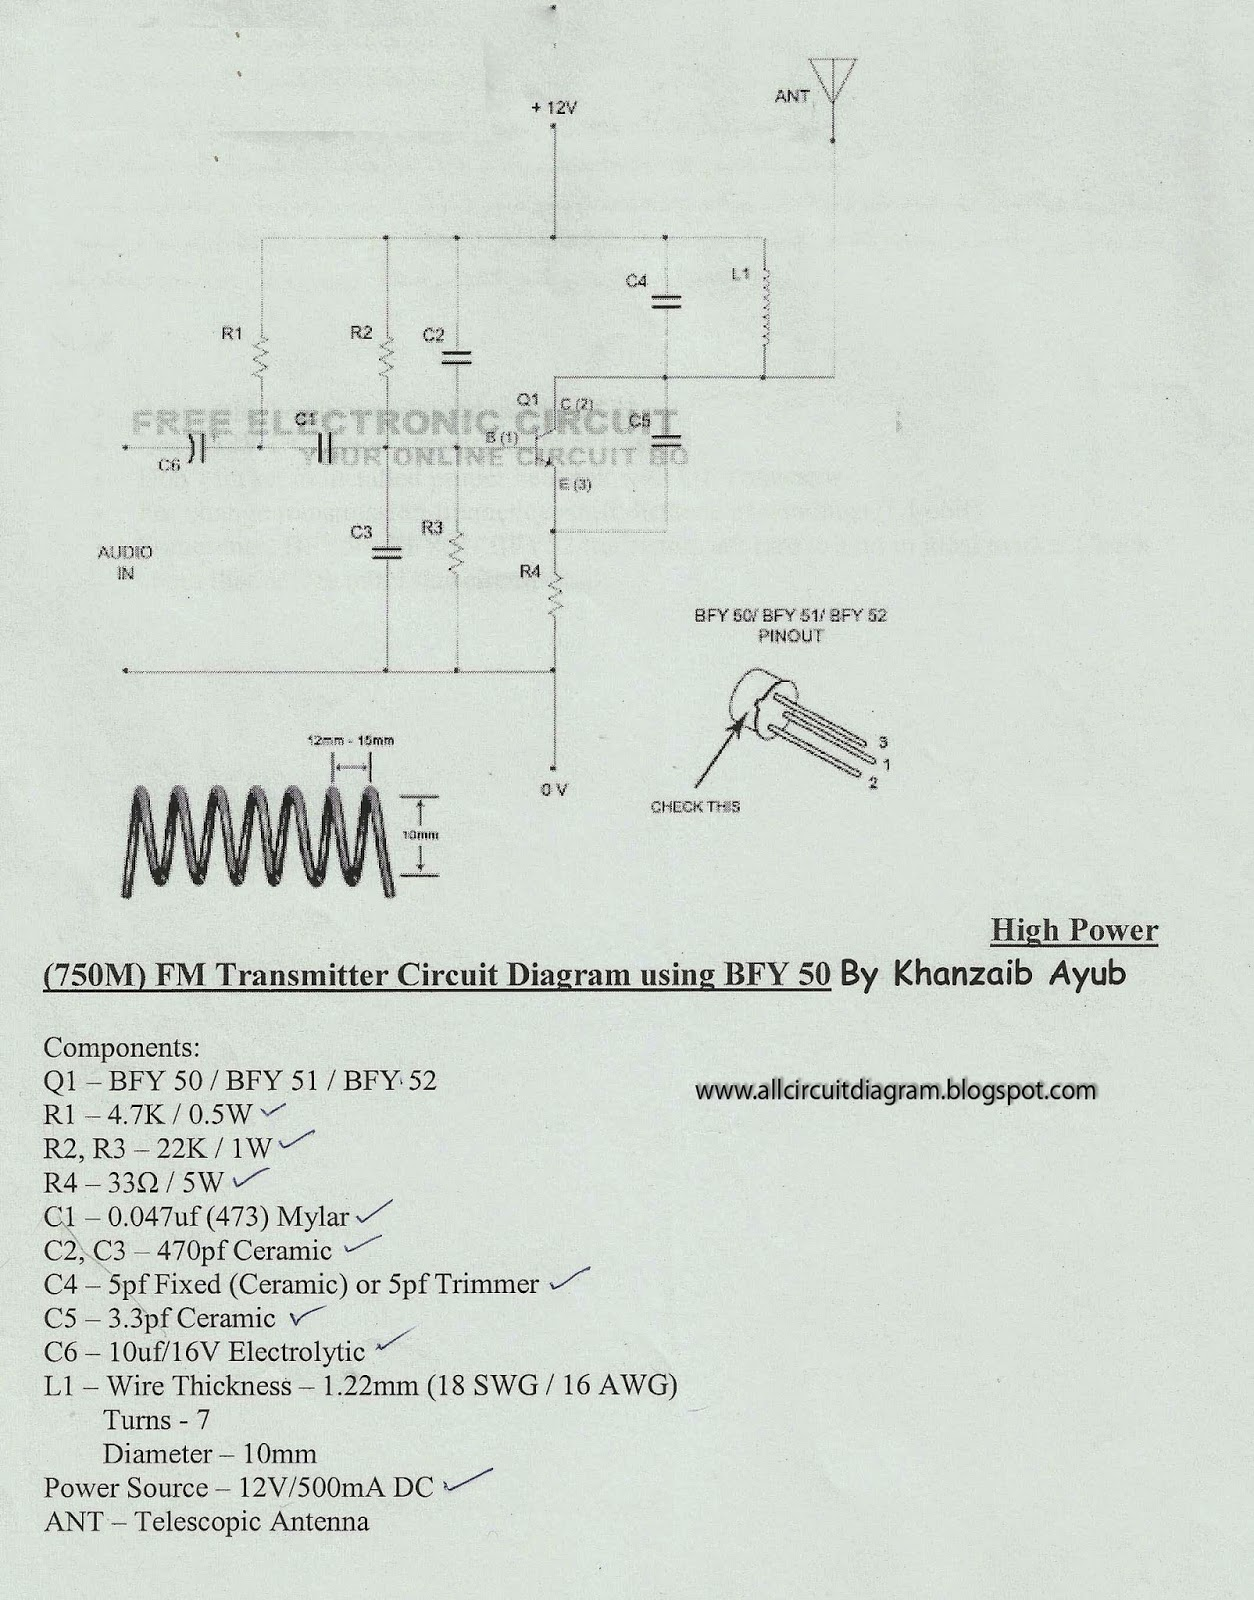 medium resolution of 750m fm transmitter circuit diagram bfy 50